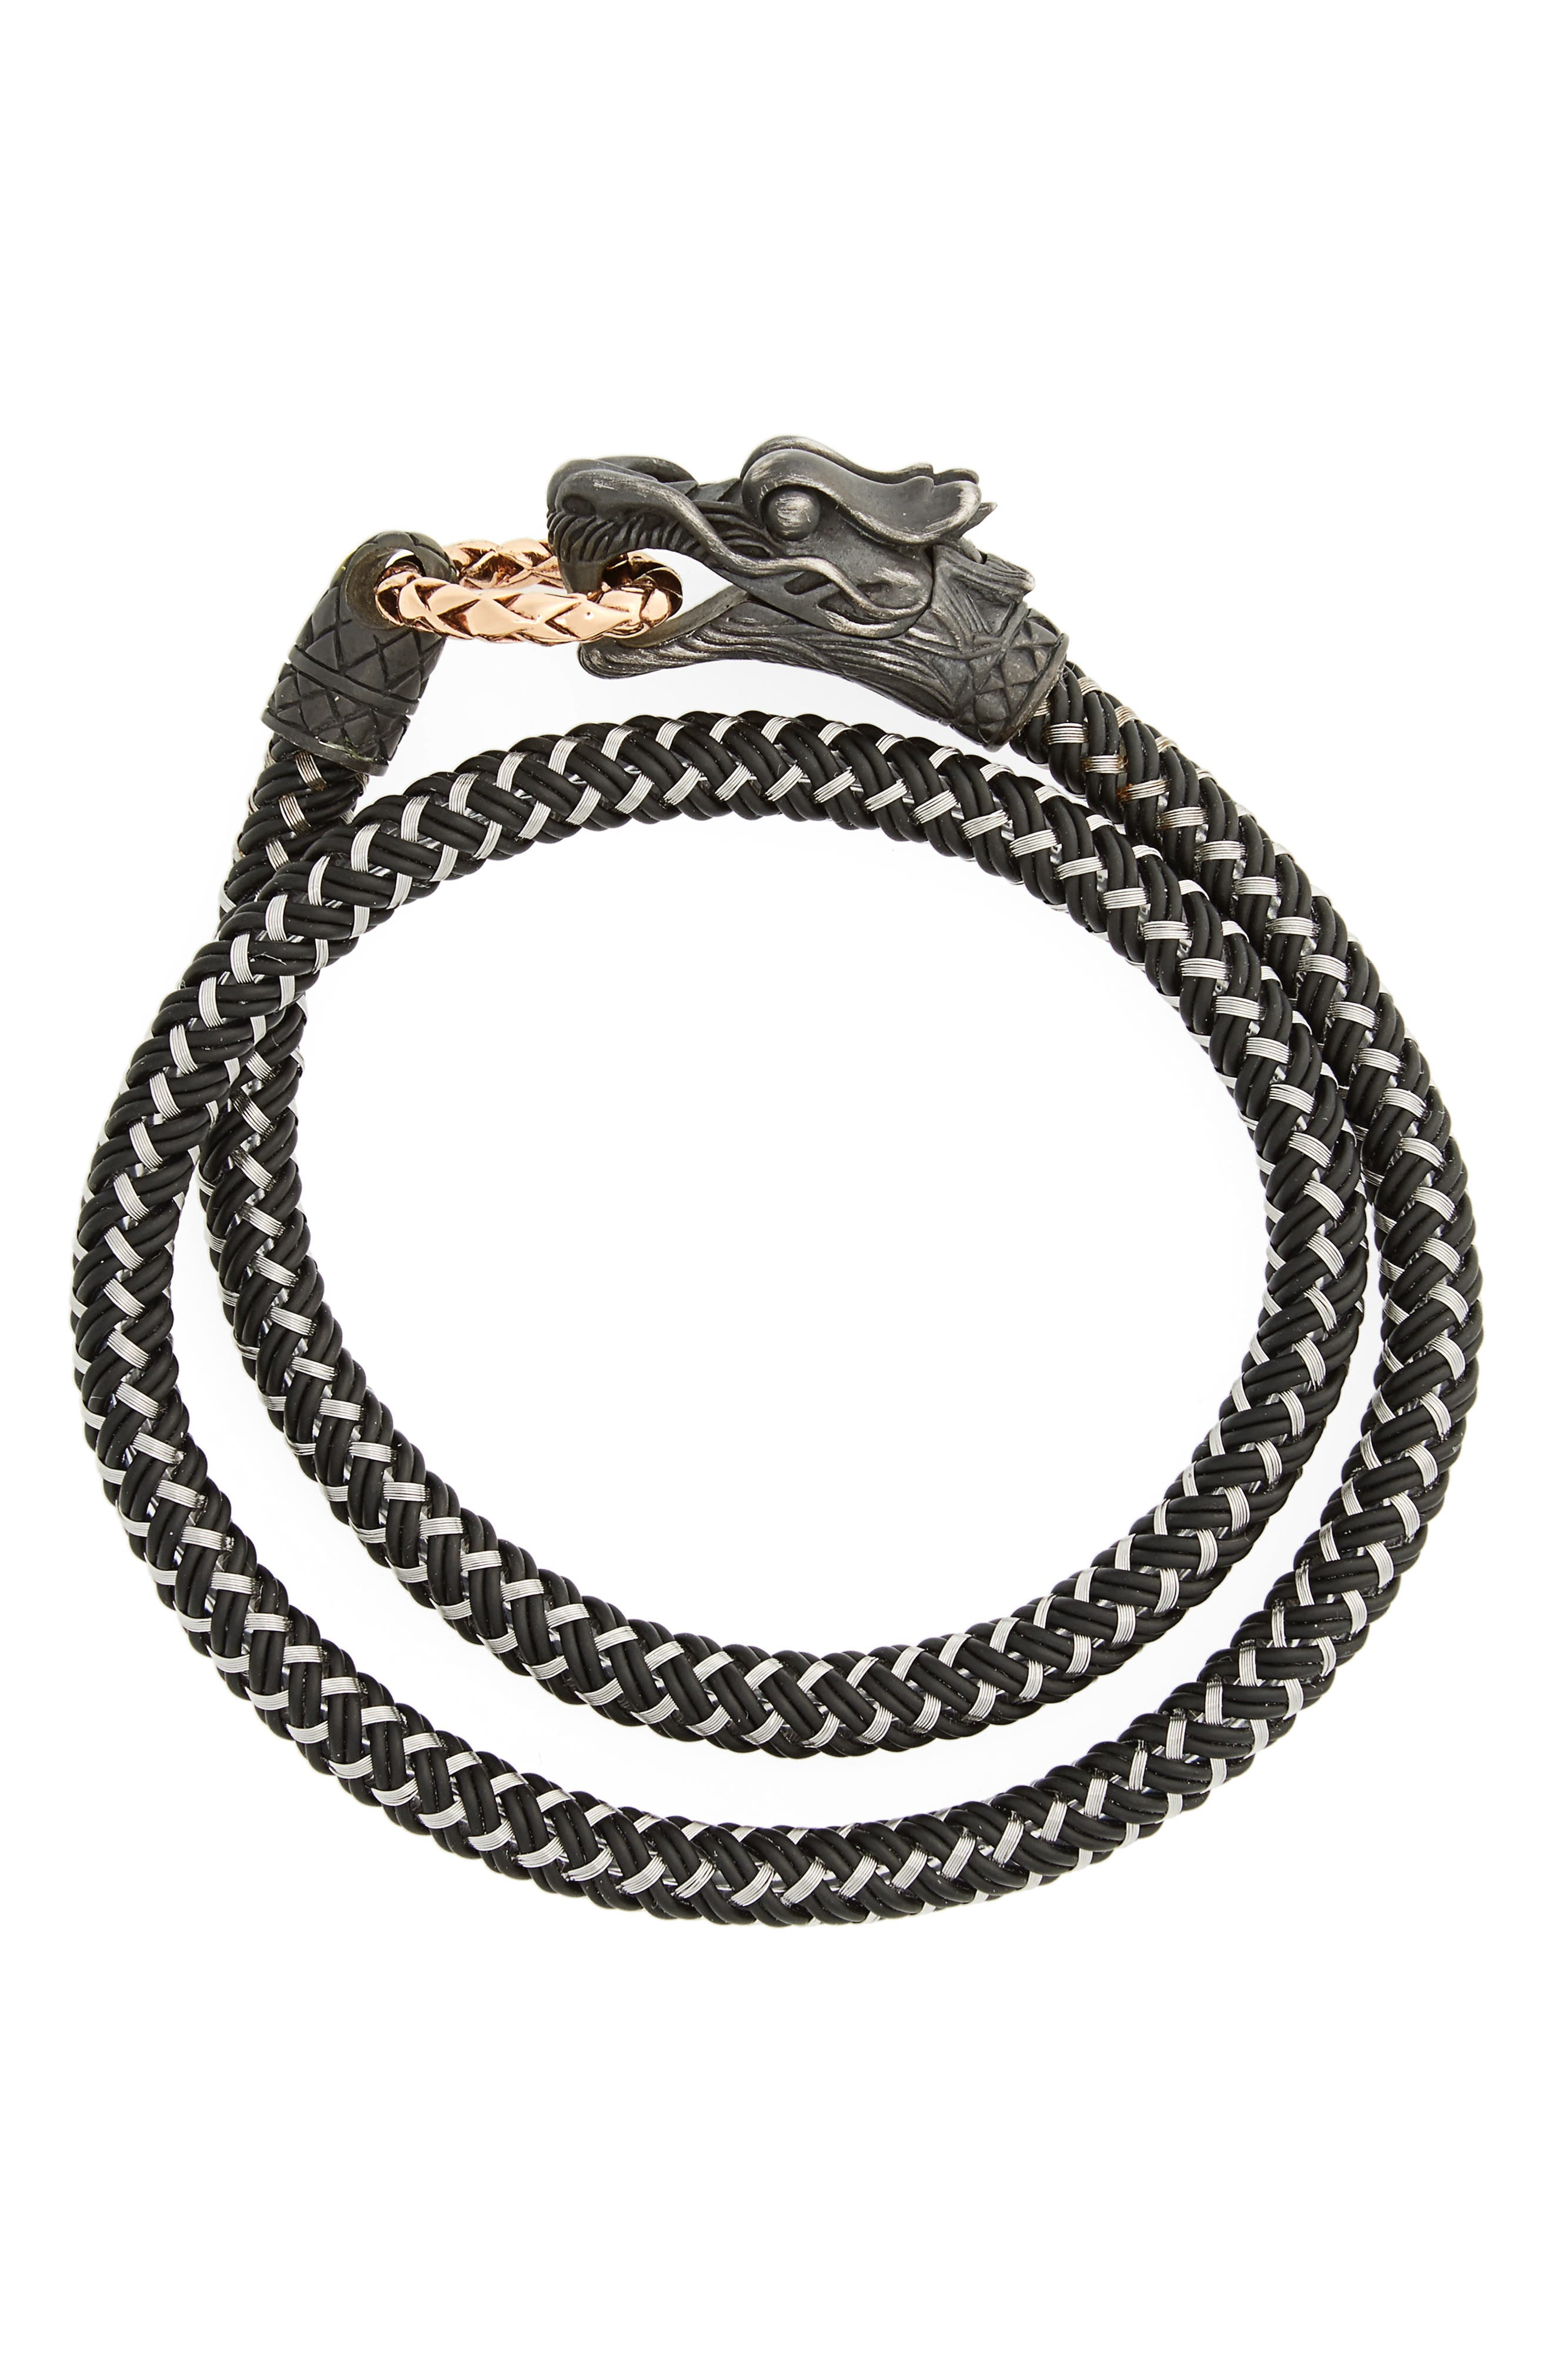 Legends Naga Wrap Bracelet,                         Main,                         color, SILVER/ BRONZE